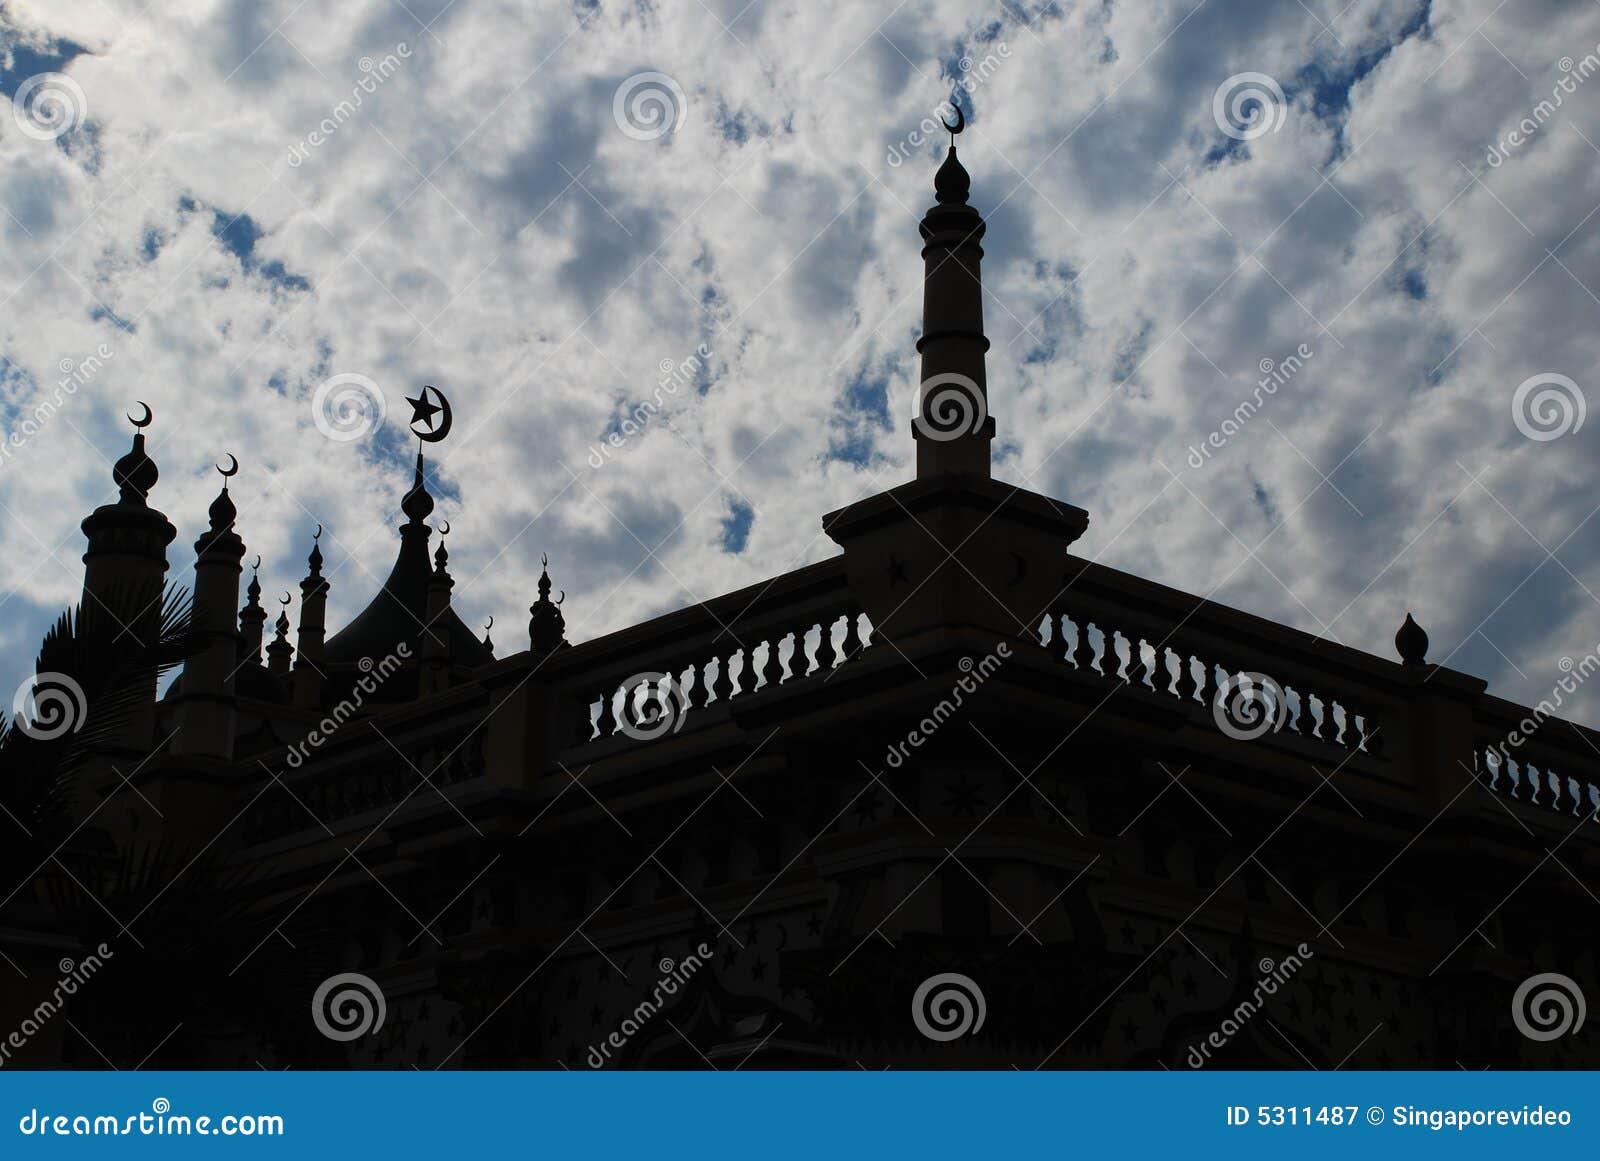 Icons of Religion - Islam 2